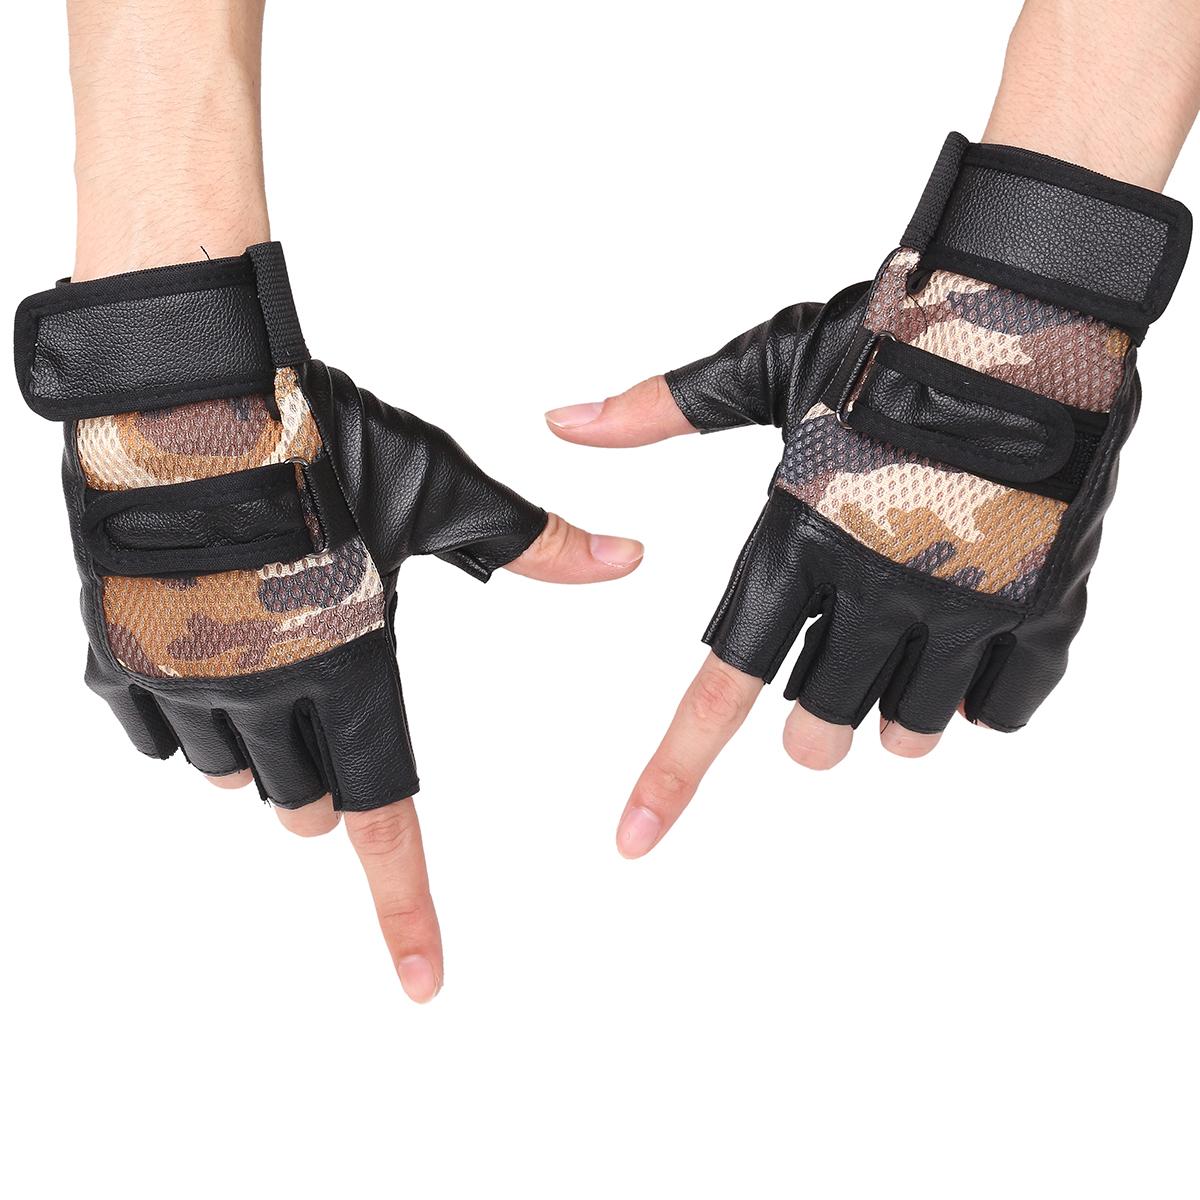 Cycling Gloves Men's Women's Mountain Bike Gloves Half Finger Biking Gloves | Anti-slip Shock-absorbing Gel Pad... by